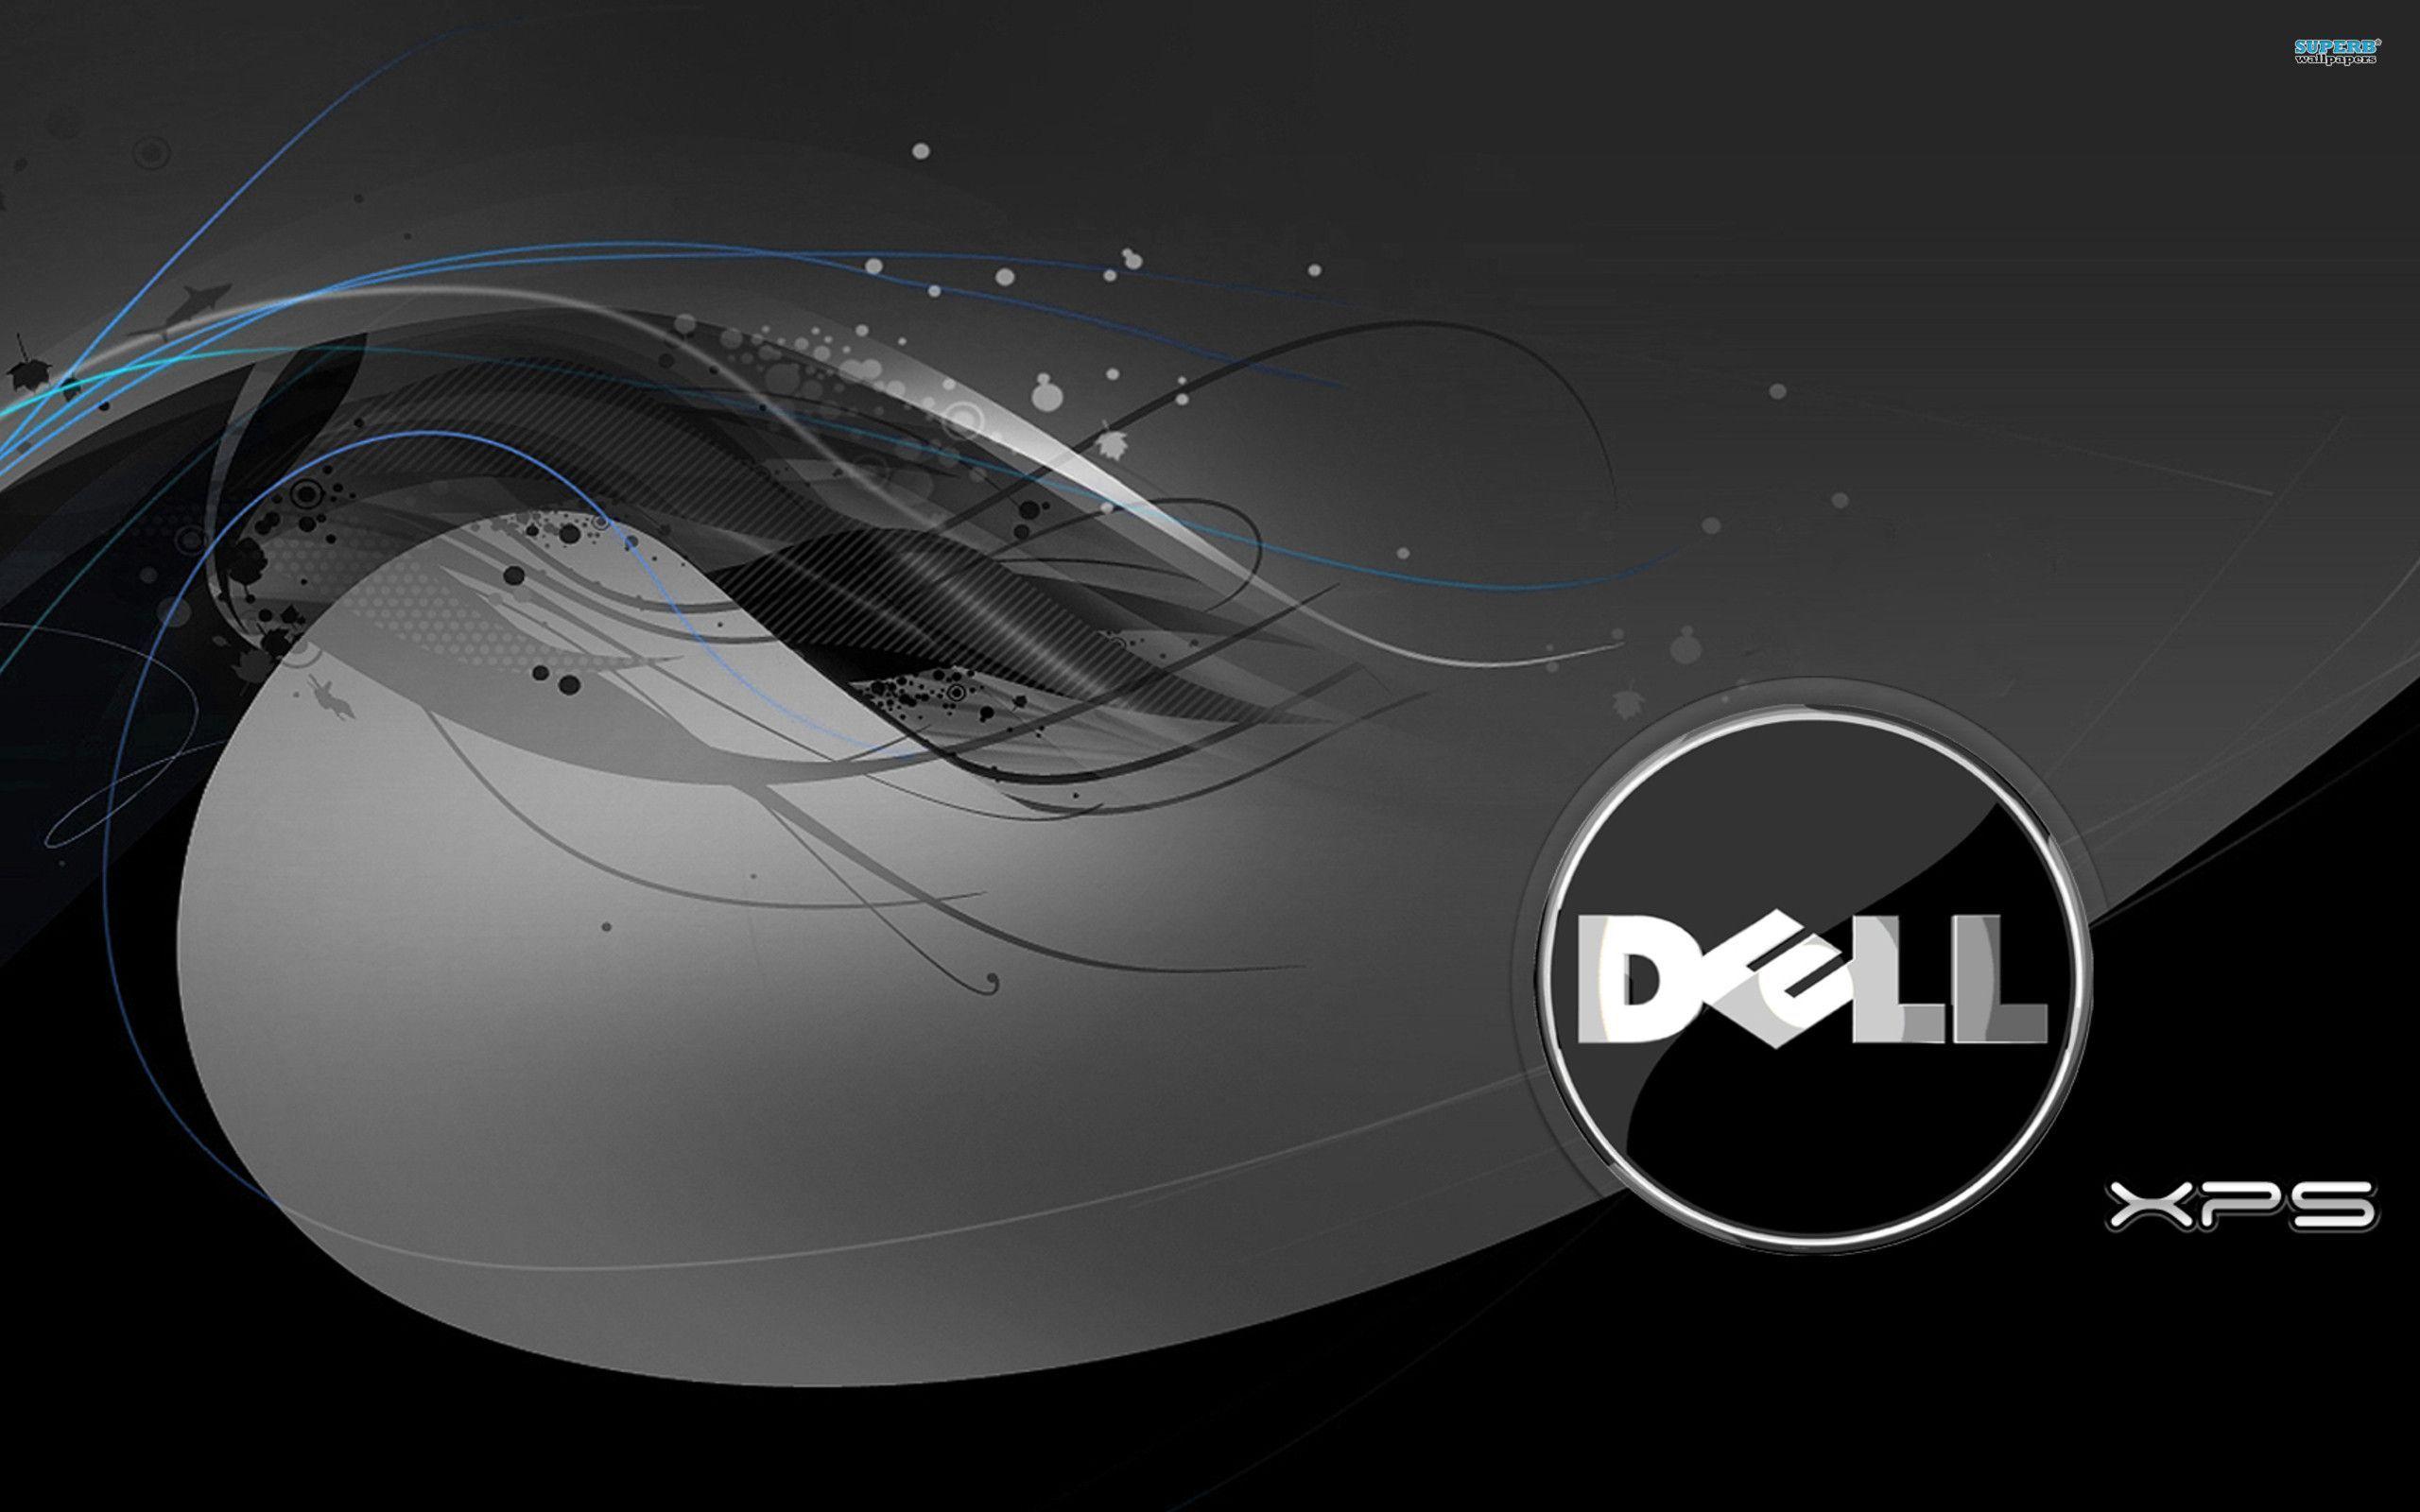 Dell desktop backgrounds wallpaper hd wallpapers pinterest dell desktop backgrounds wallpaper buycottarizona